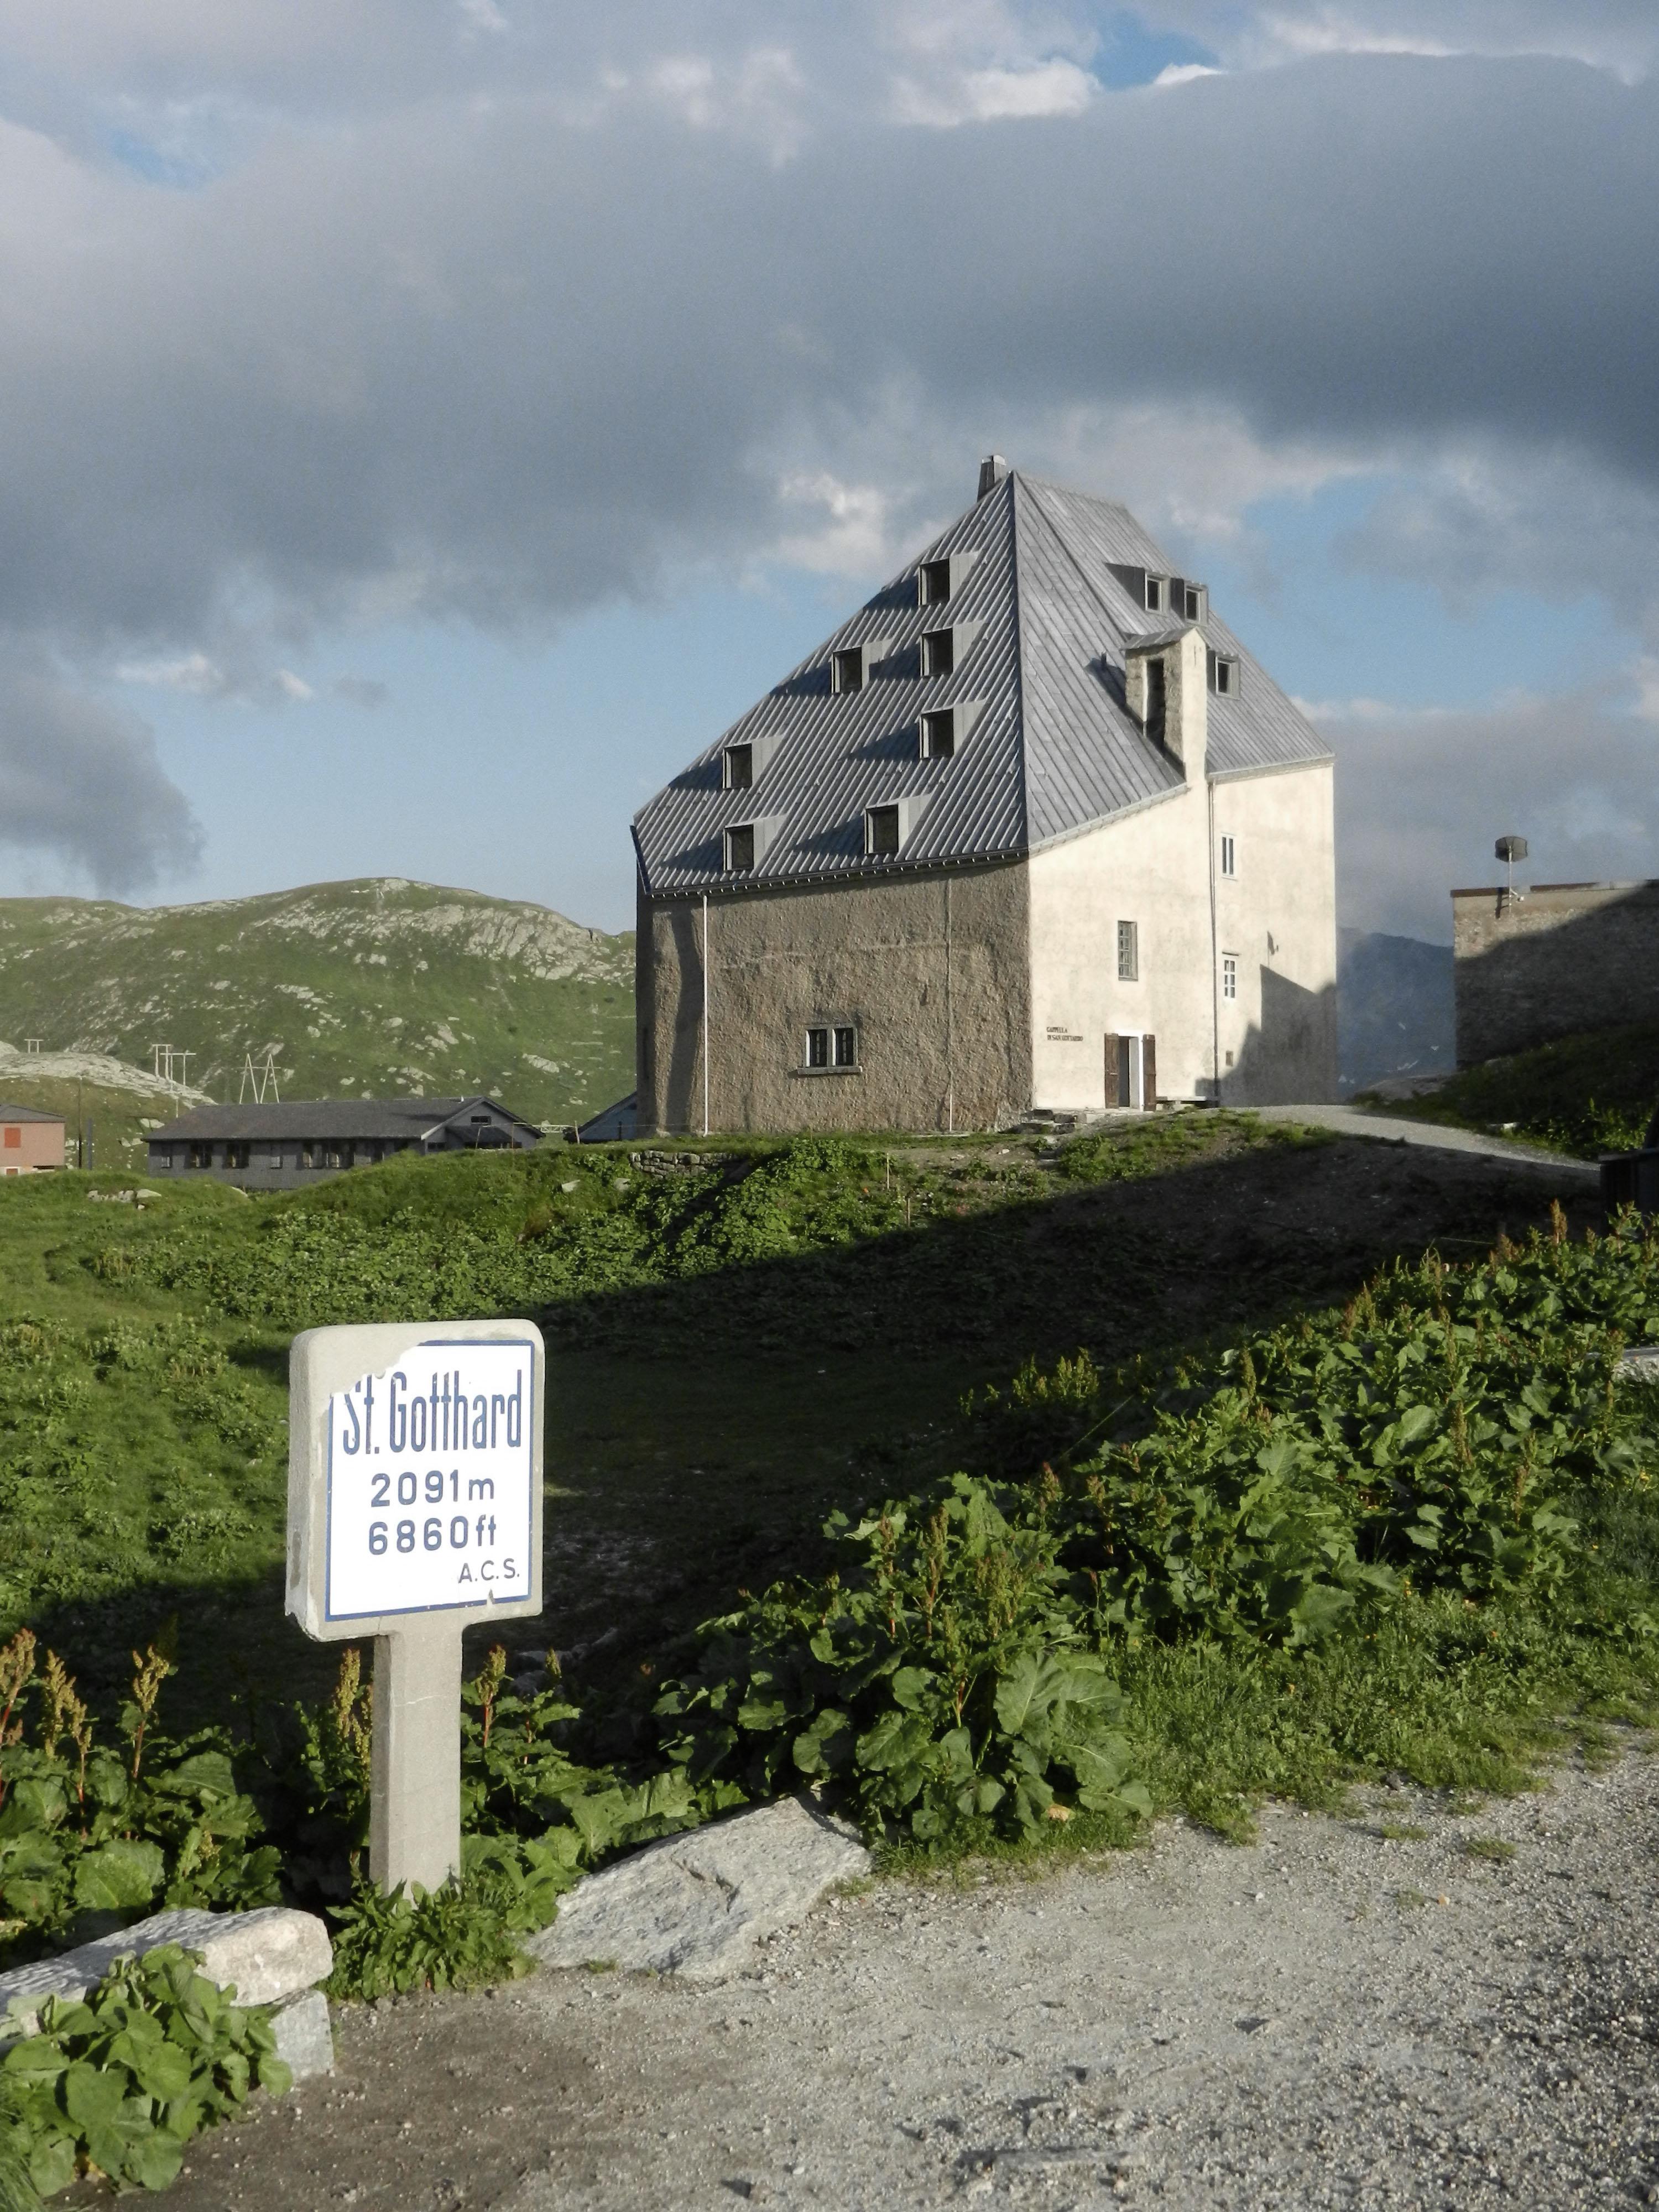 St Gotthard Hospiz file altes hospiz am gotthardpass nach dem umbau durch miller